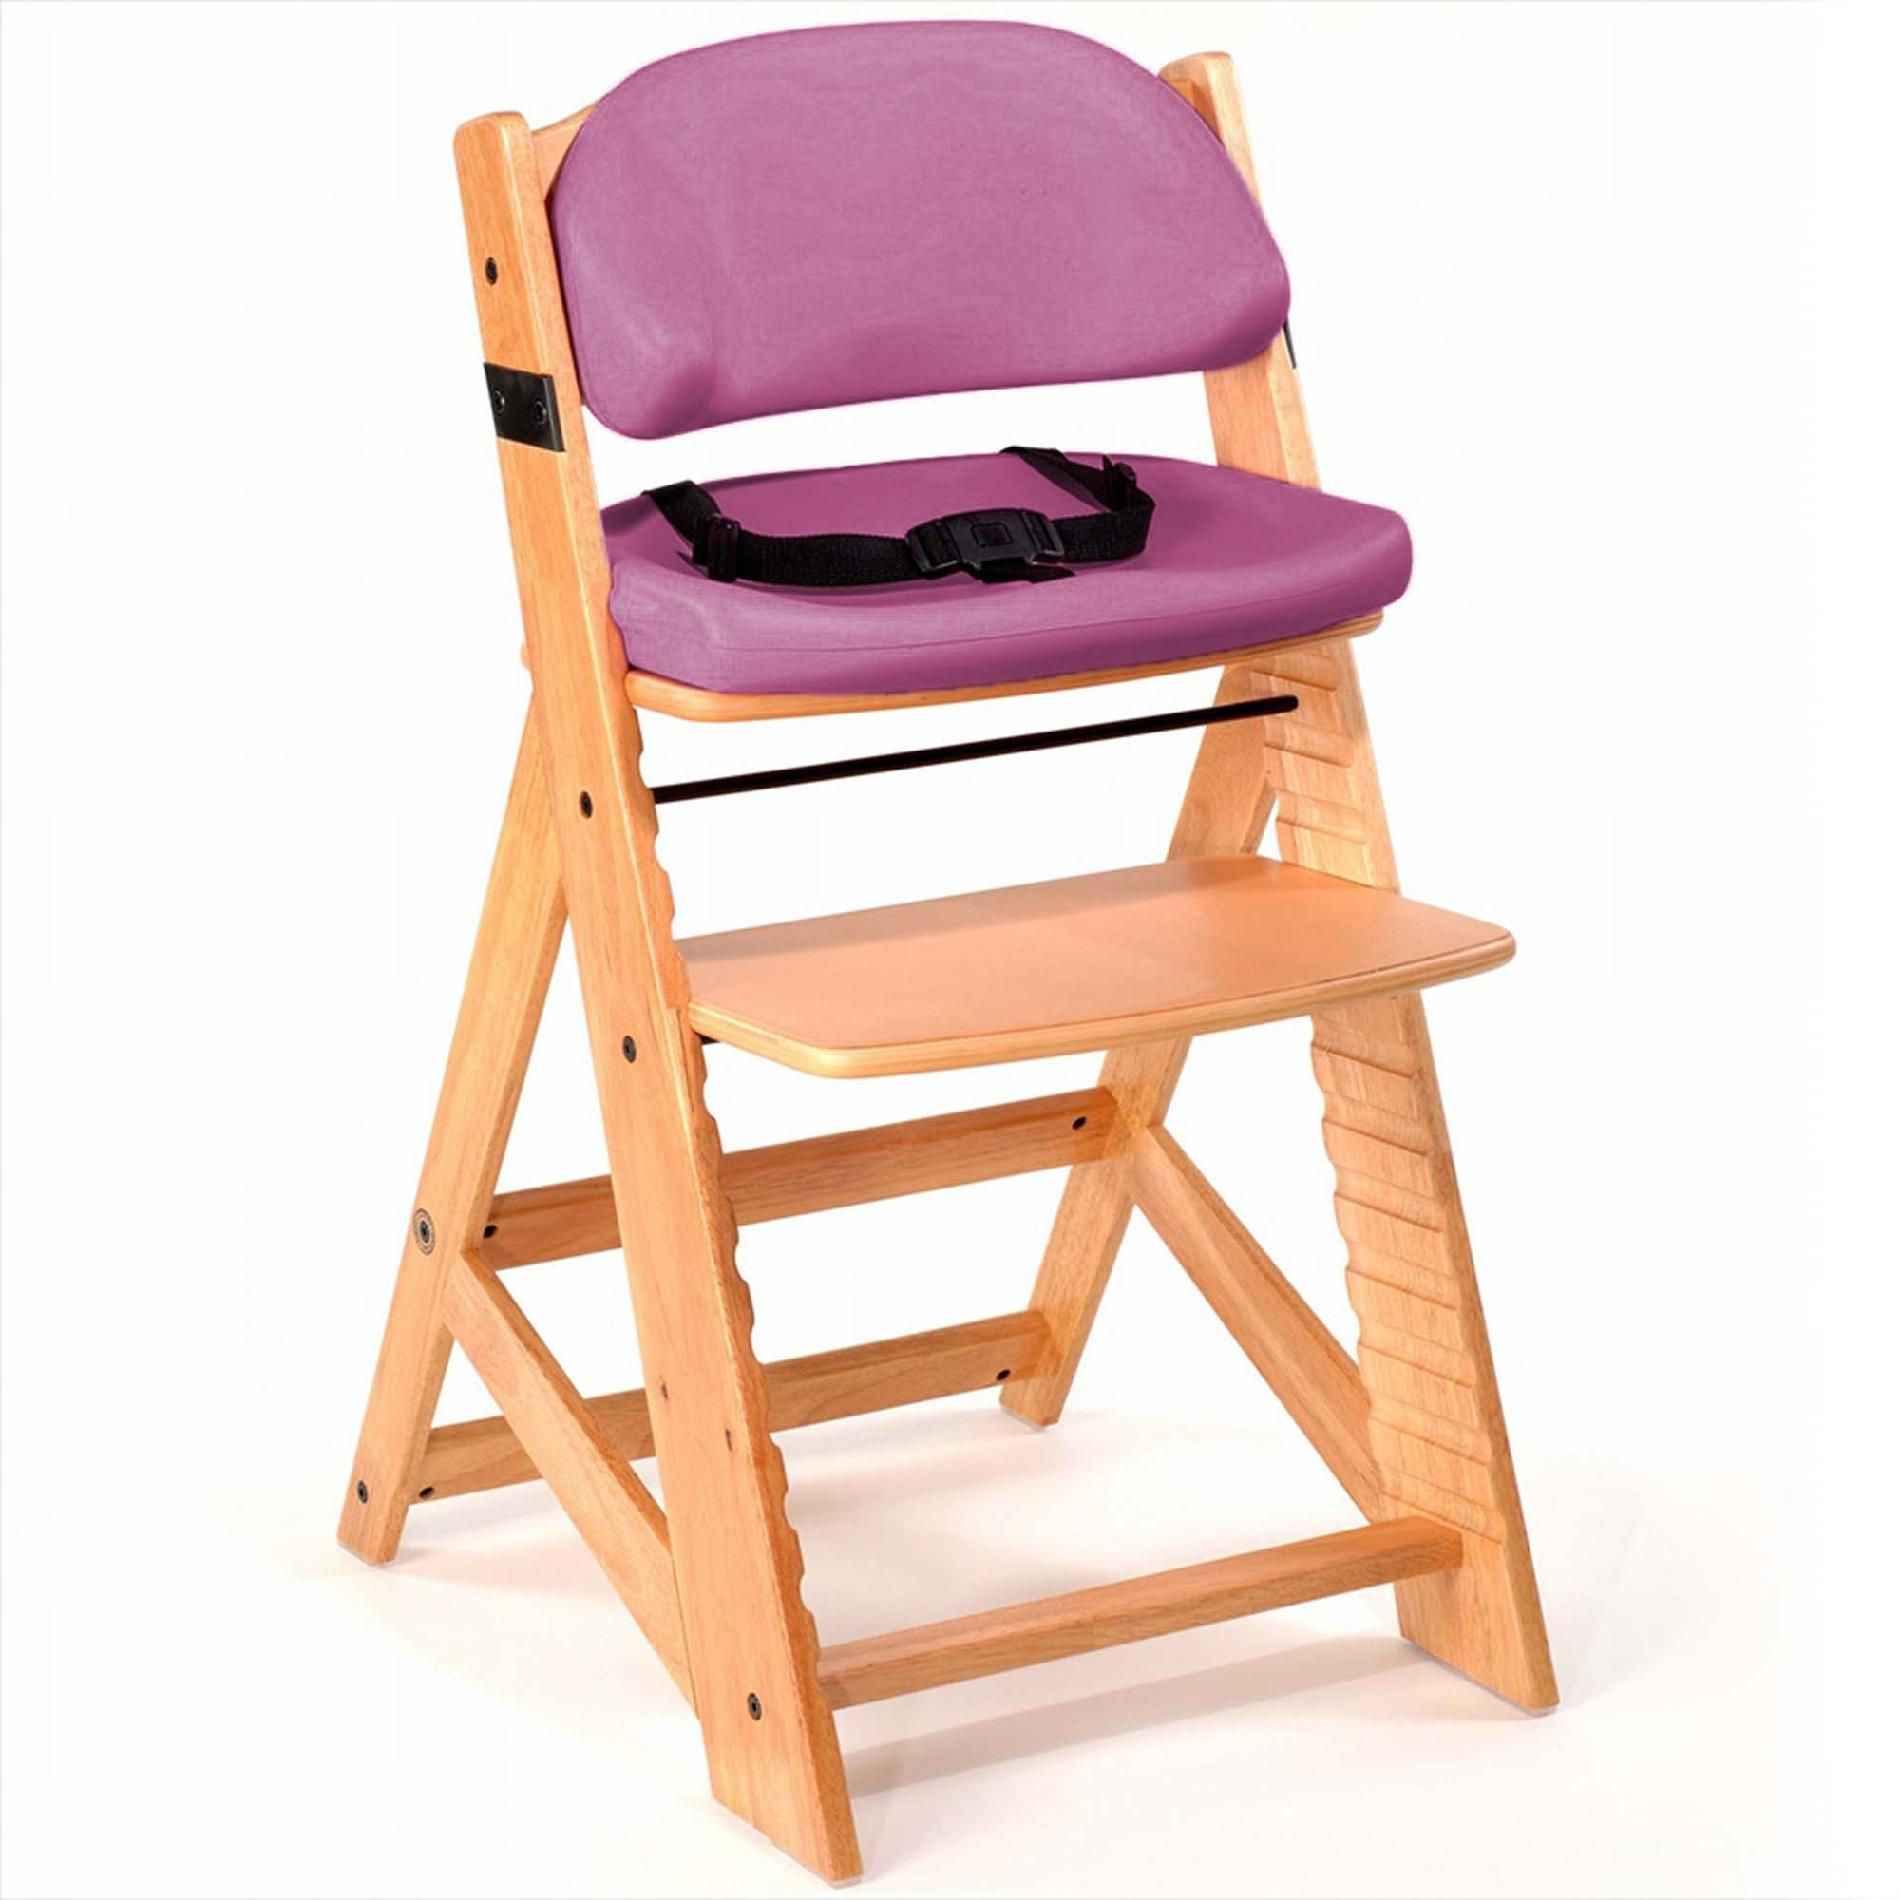 baby height chair acrylic chairs keekaroo right kids with comfort cushions